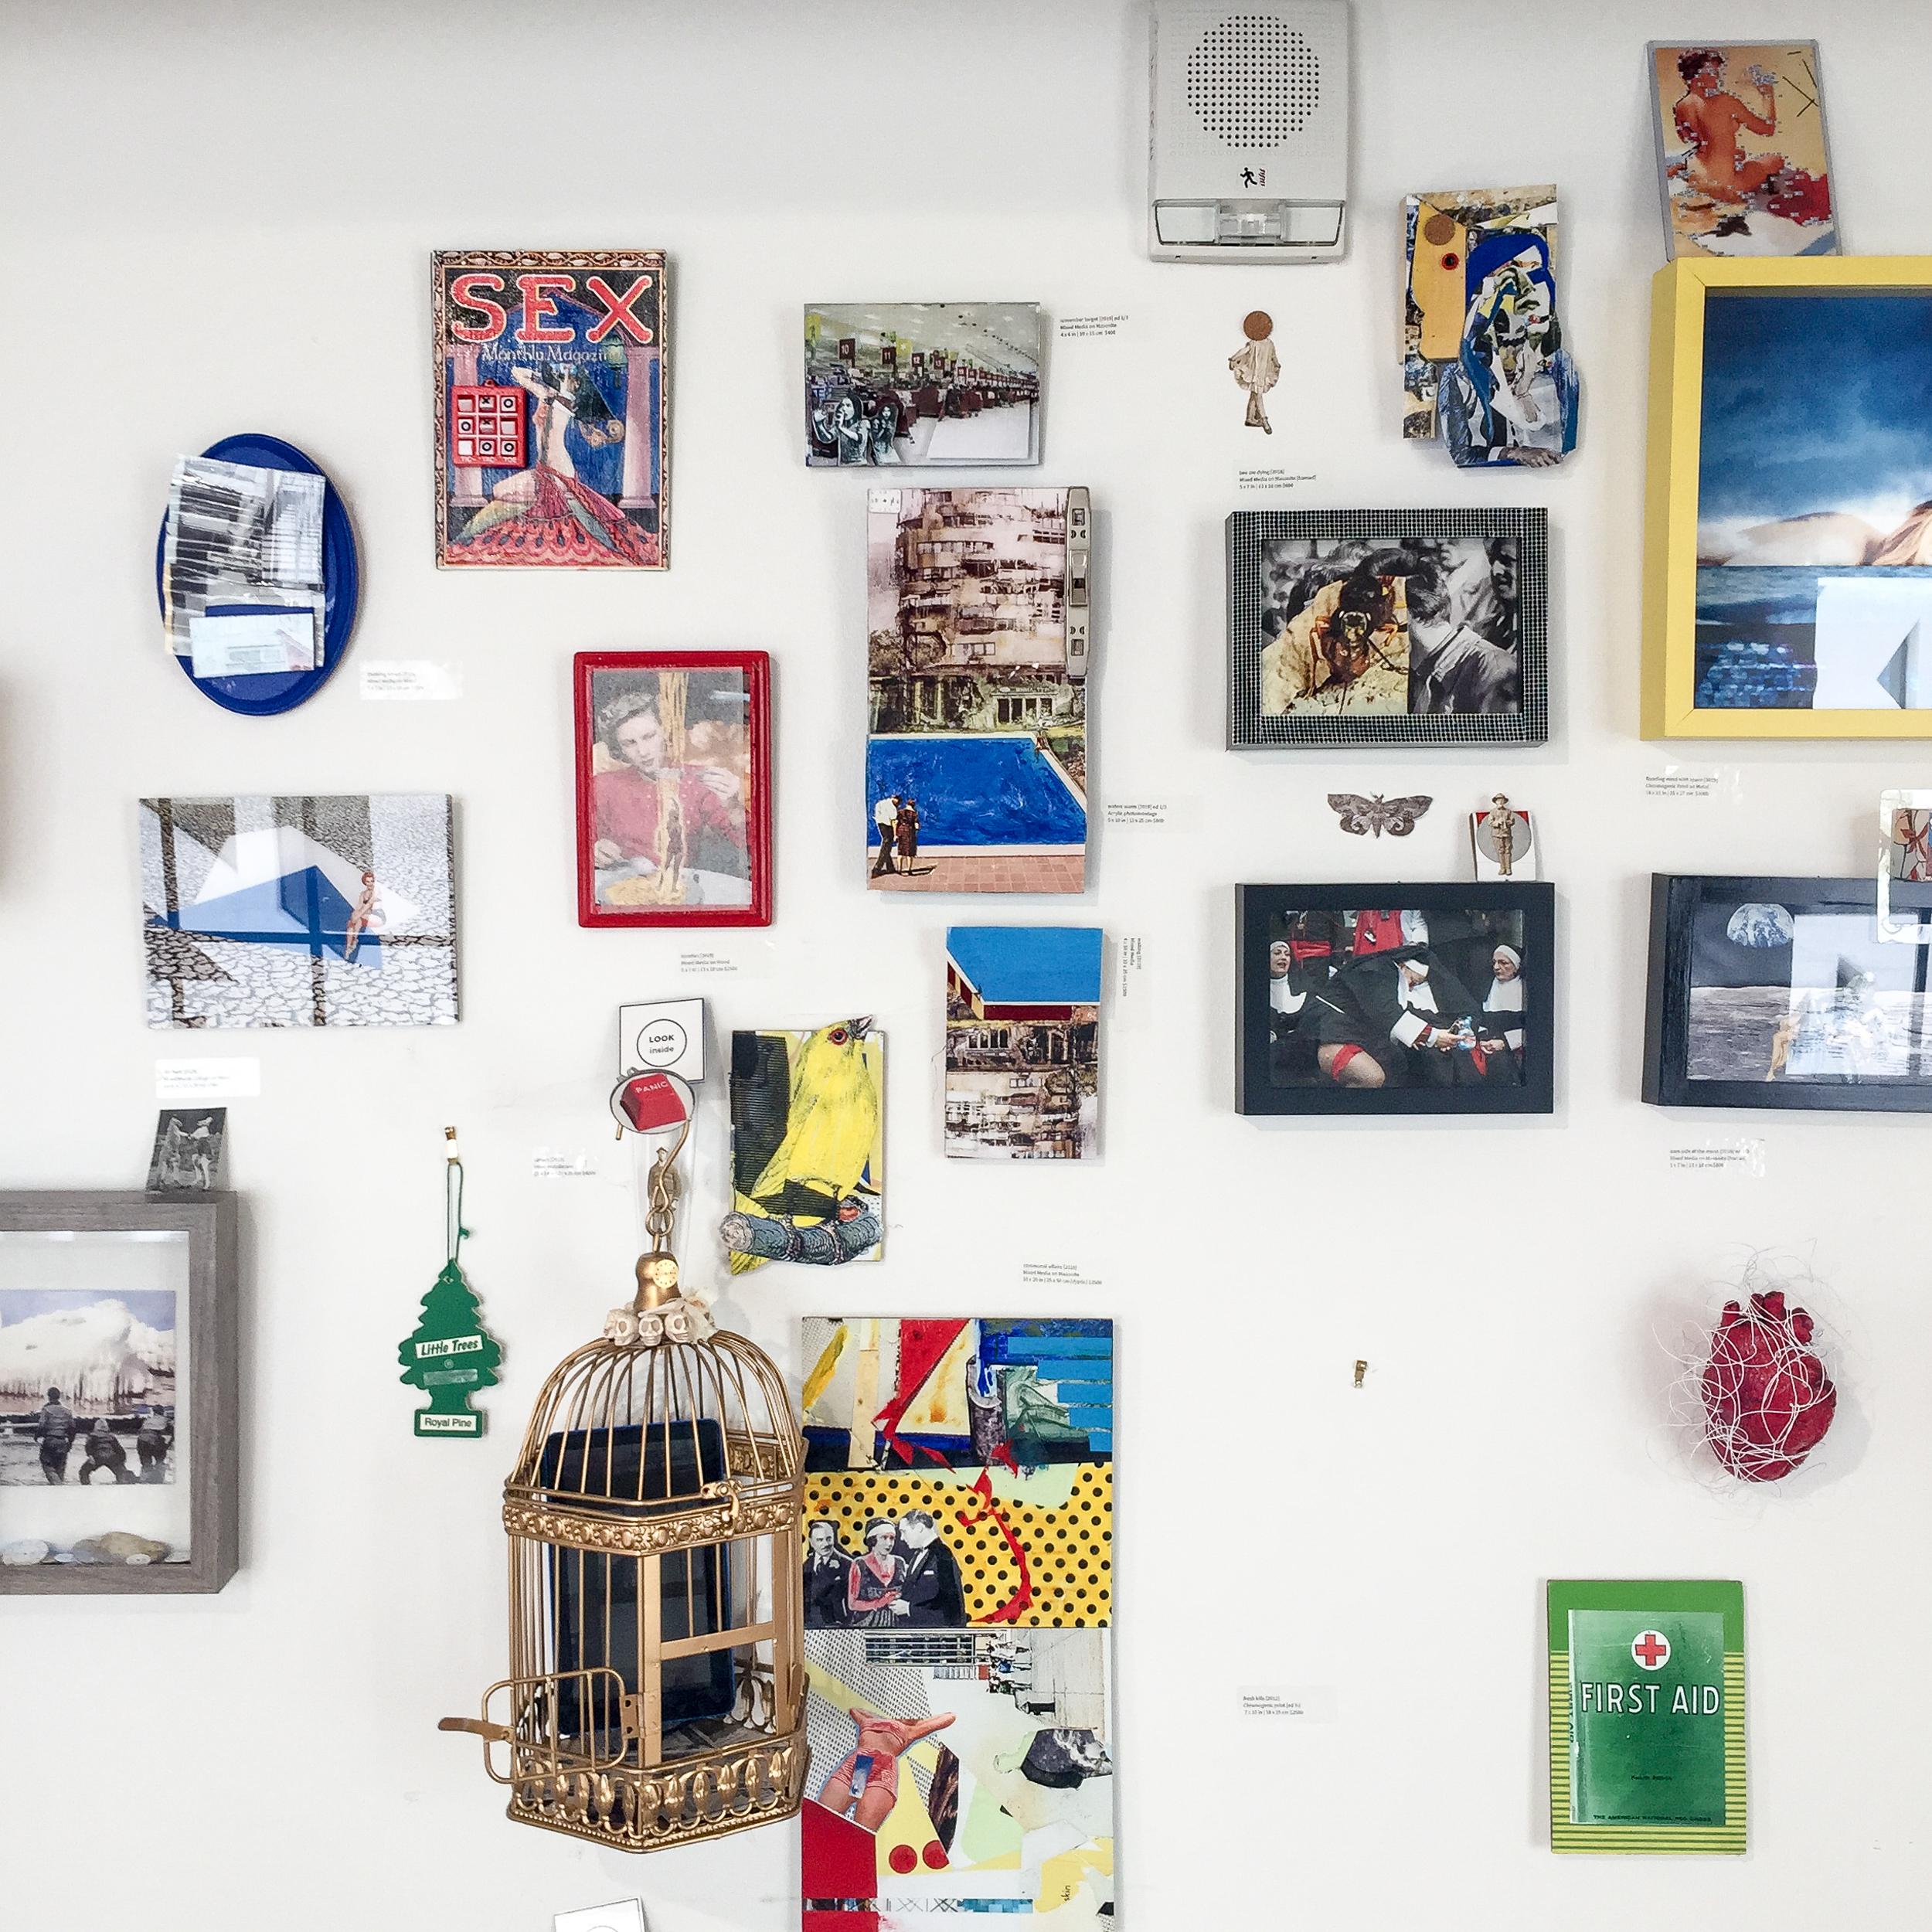 Faena-Exhibition-Images-81.jpg